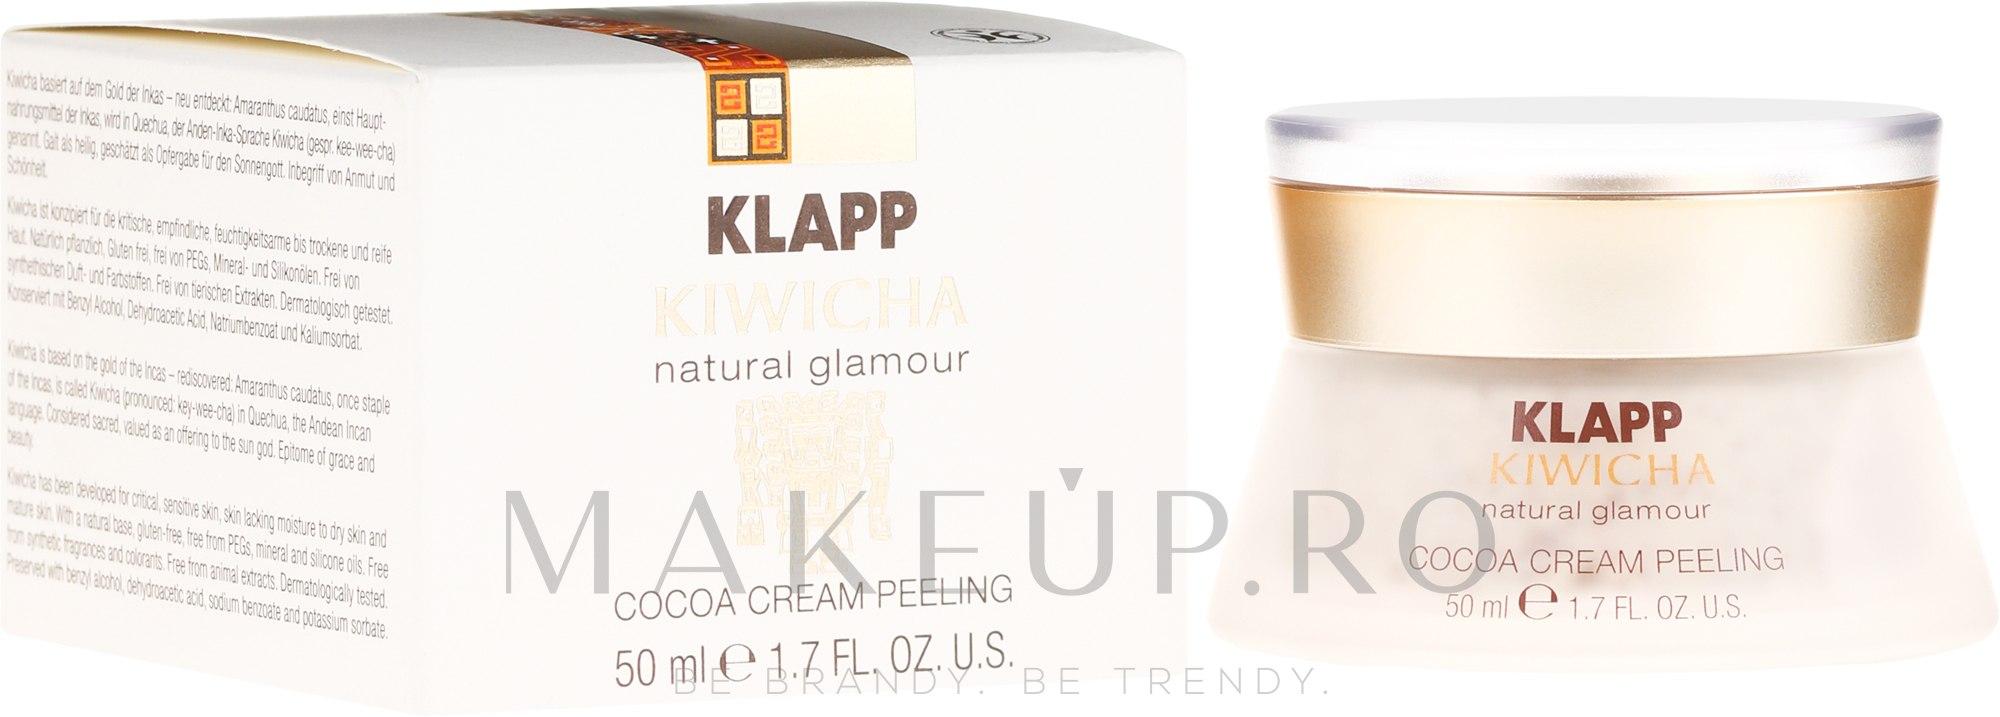 Peeling facial - Klapp Kiwicha Cocoa Cream Peeling — Imagine 50 ml